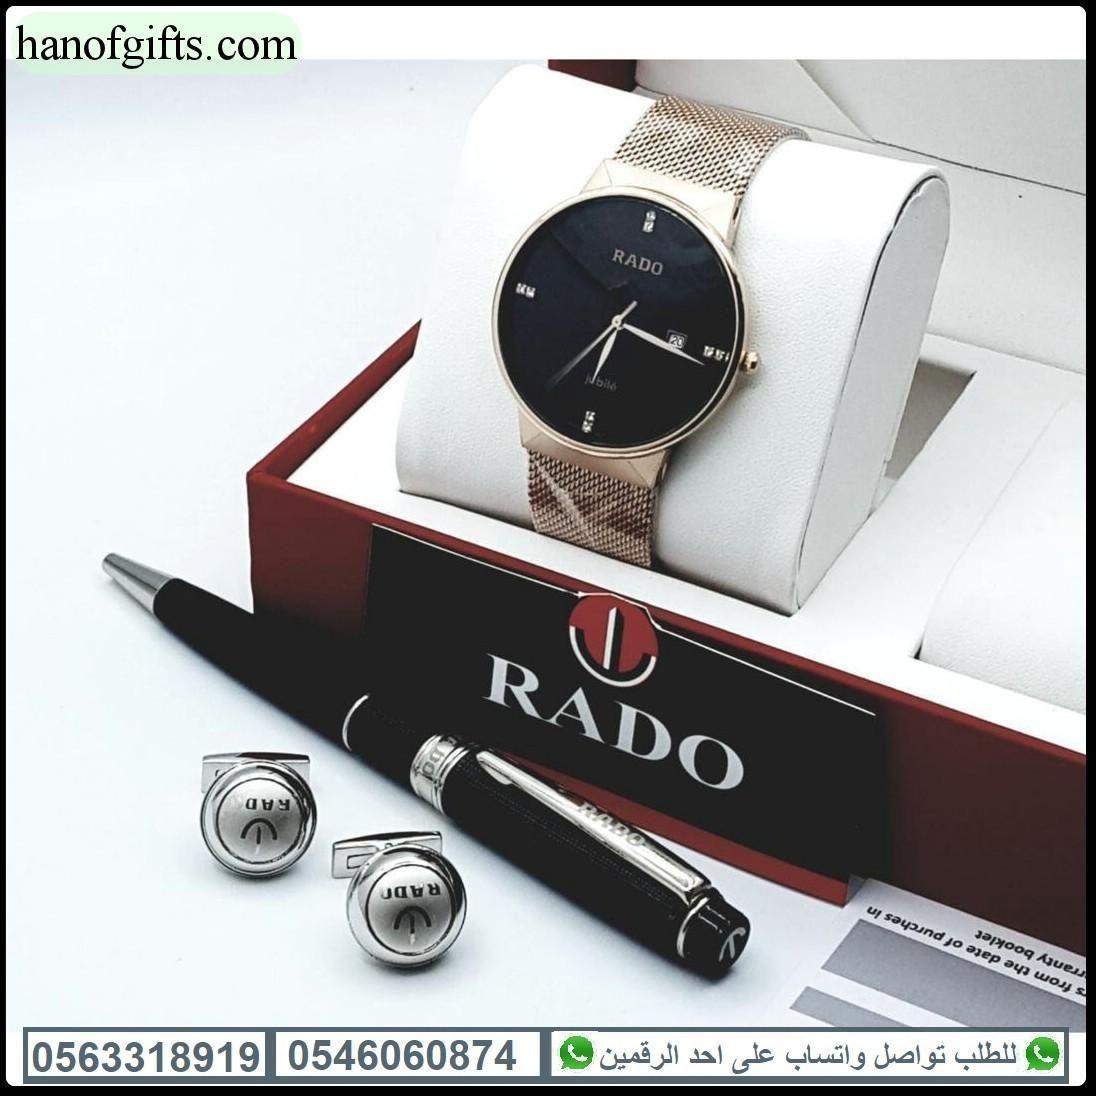 ساعات رادو رجالية مع قلم و كبك و علبة حلوه و كرت ماركه Daniel Wellington Accessories Watches